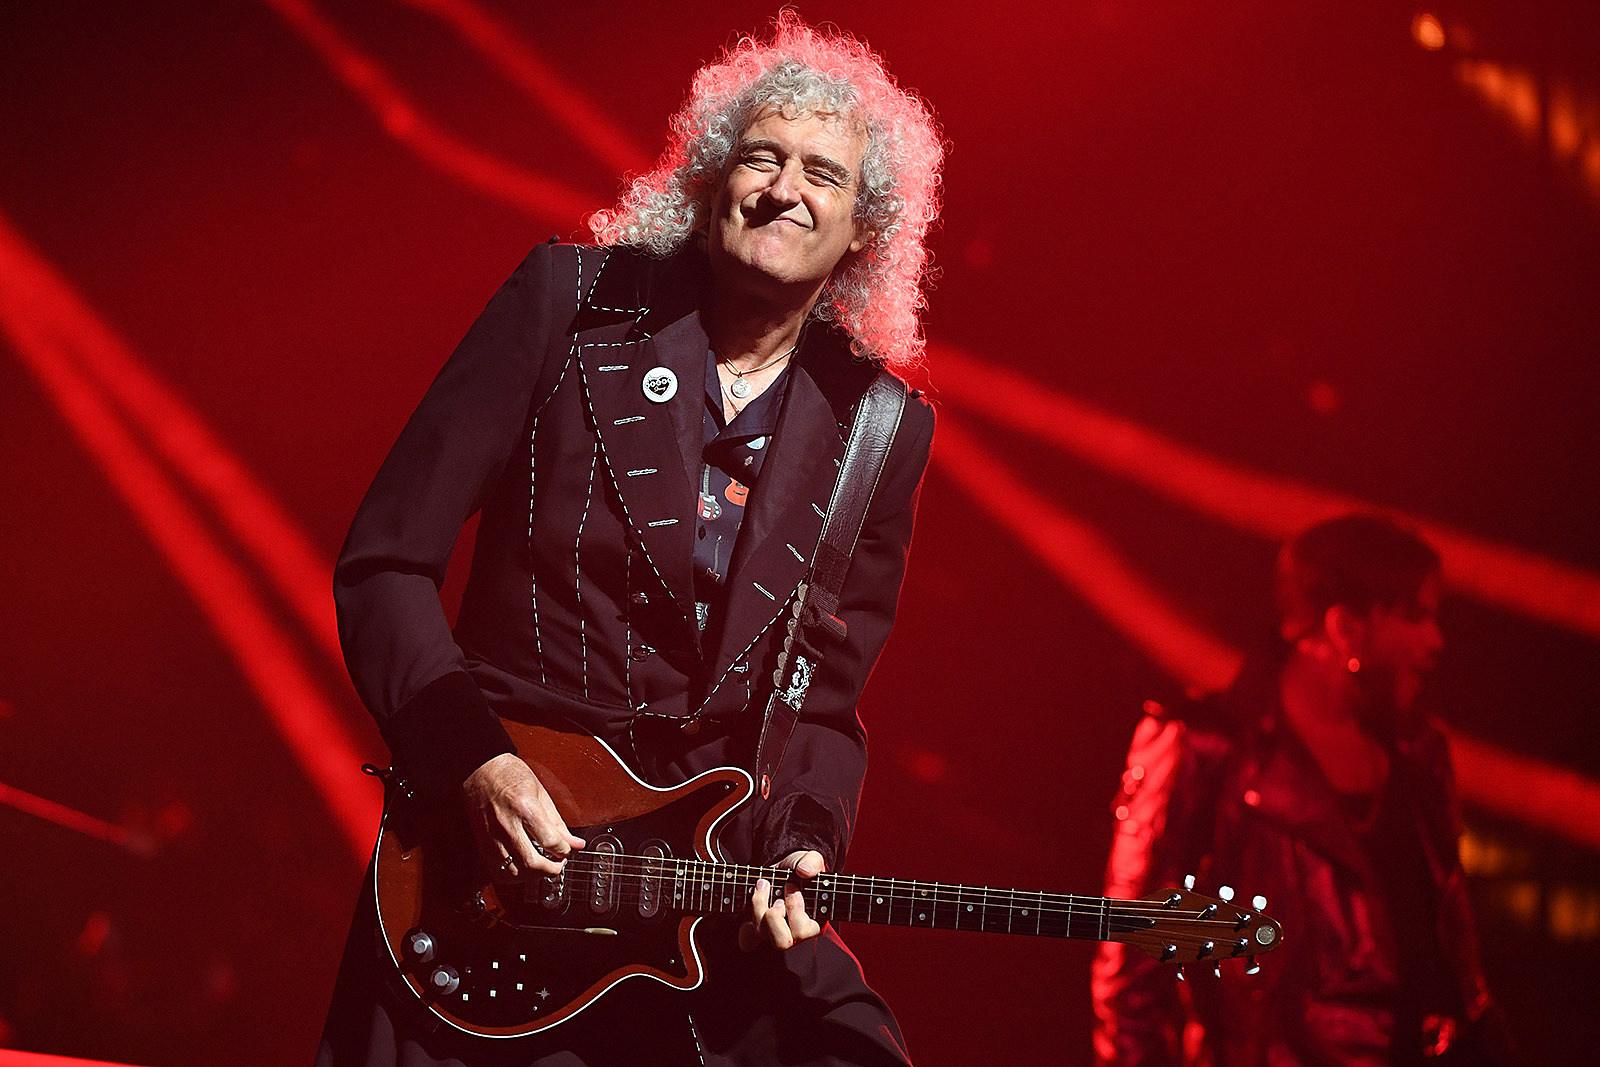 Old Queen Joke Still Makes Brian May Laugh